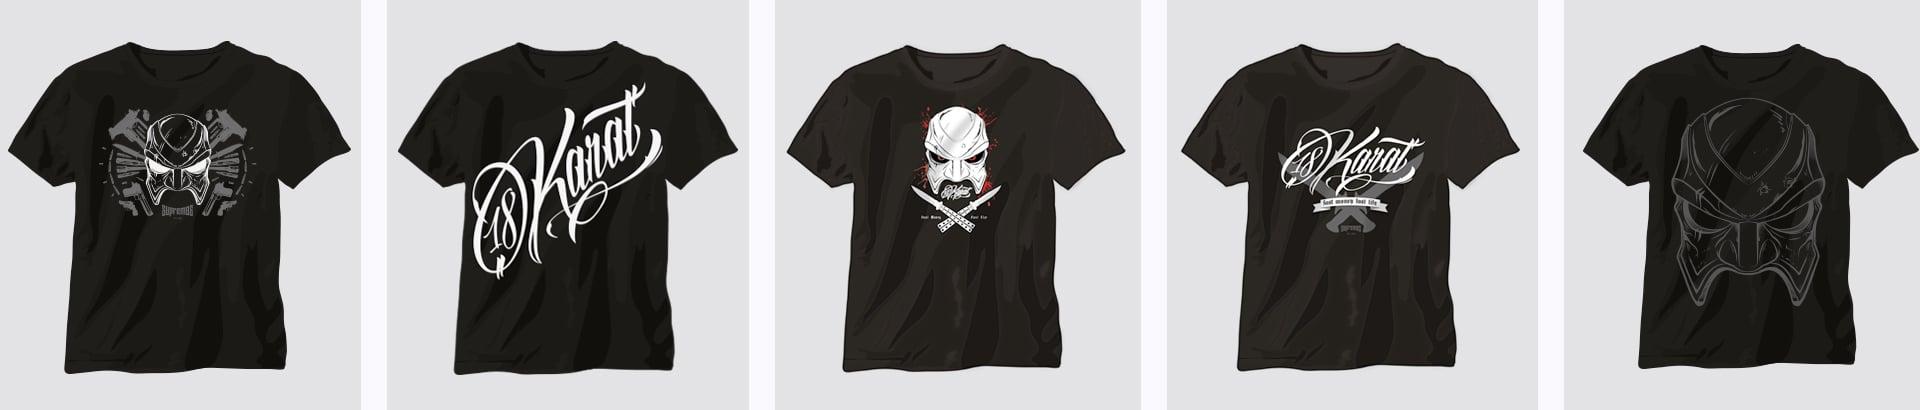 18 Karat T-Shirts Designkonzept